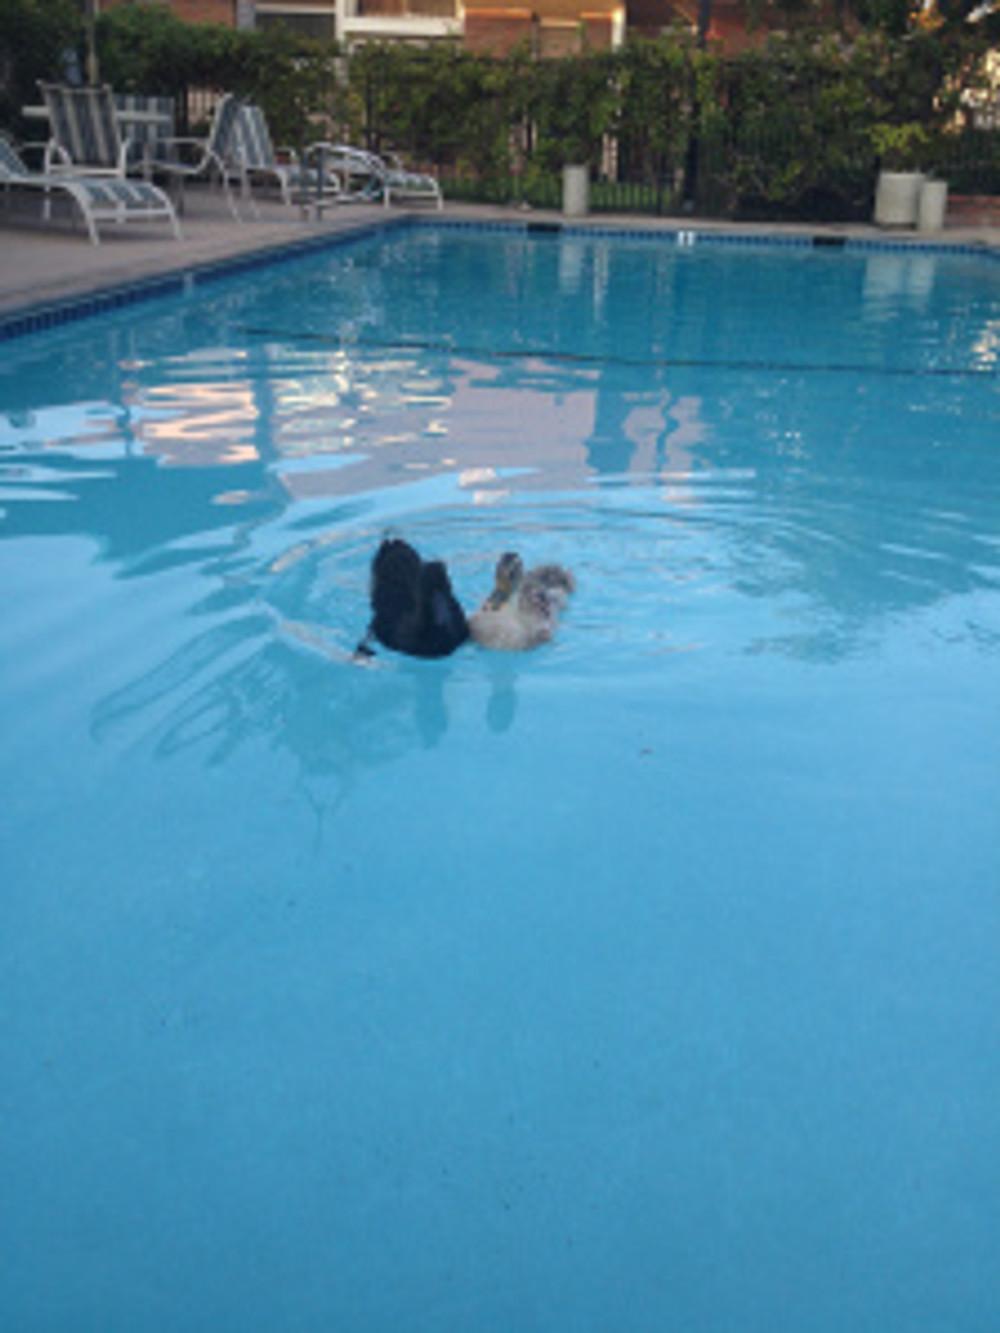 ducks-in-the-pool